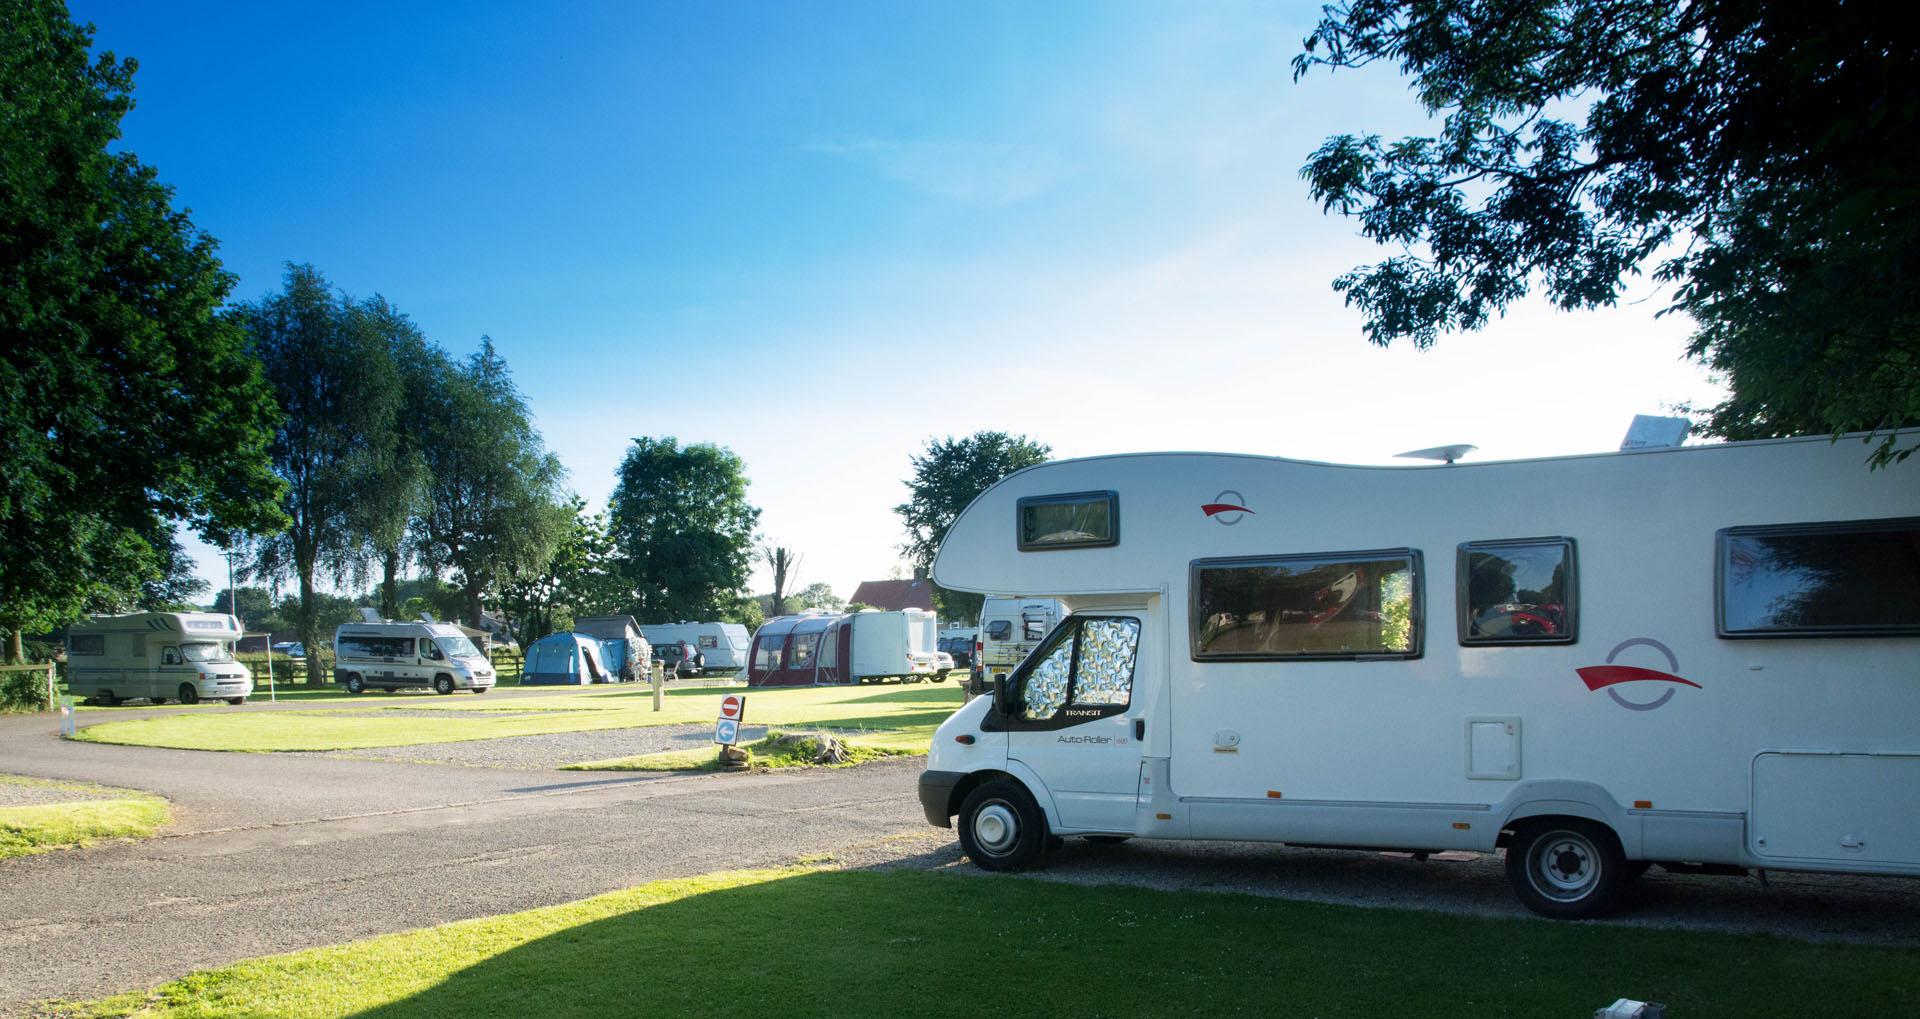 Devizes Camping and Caravanning Club Site, Melksham